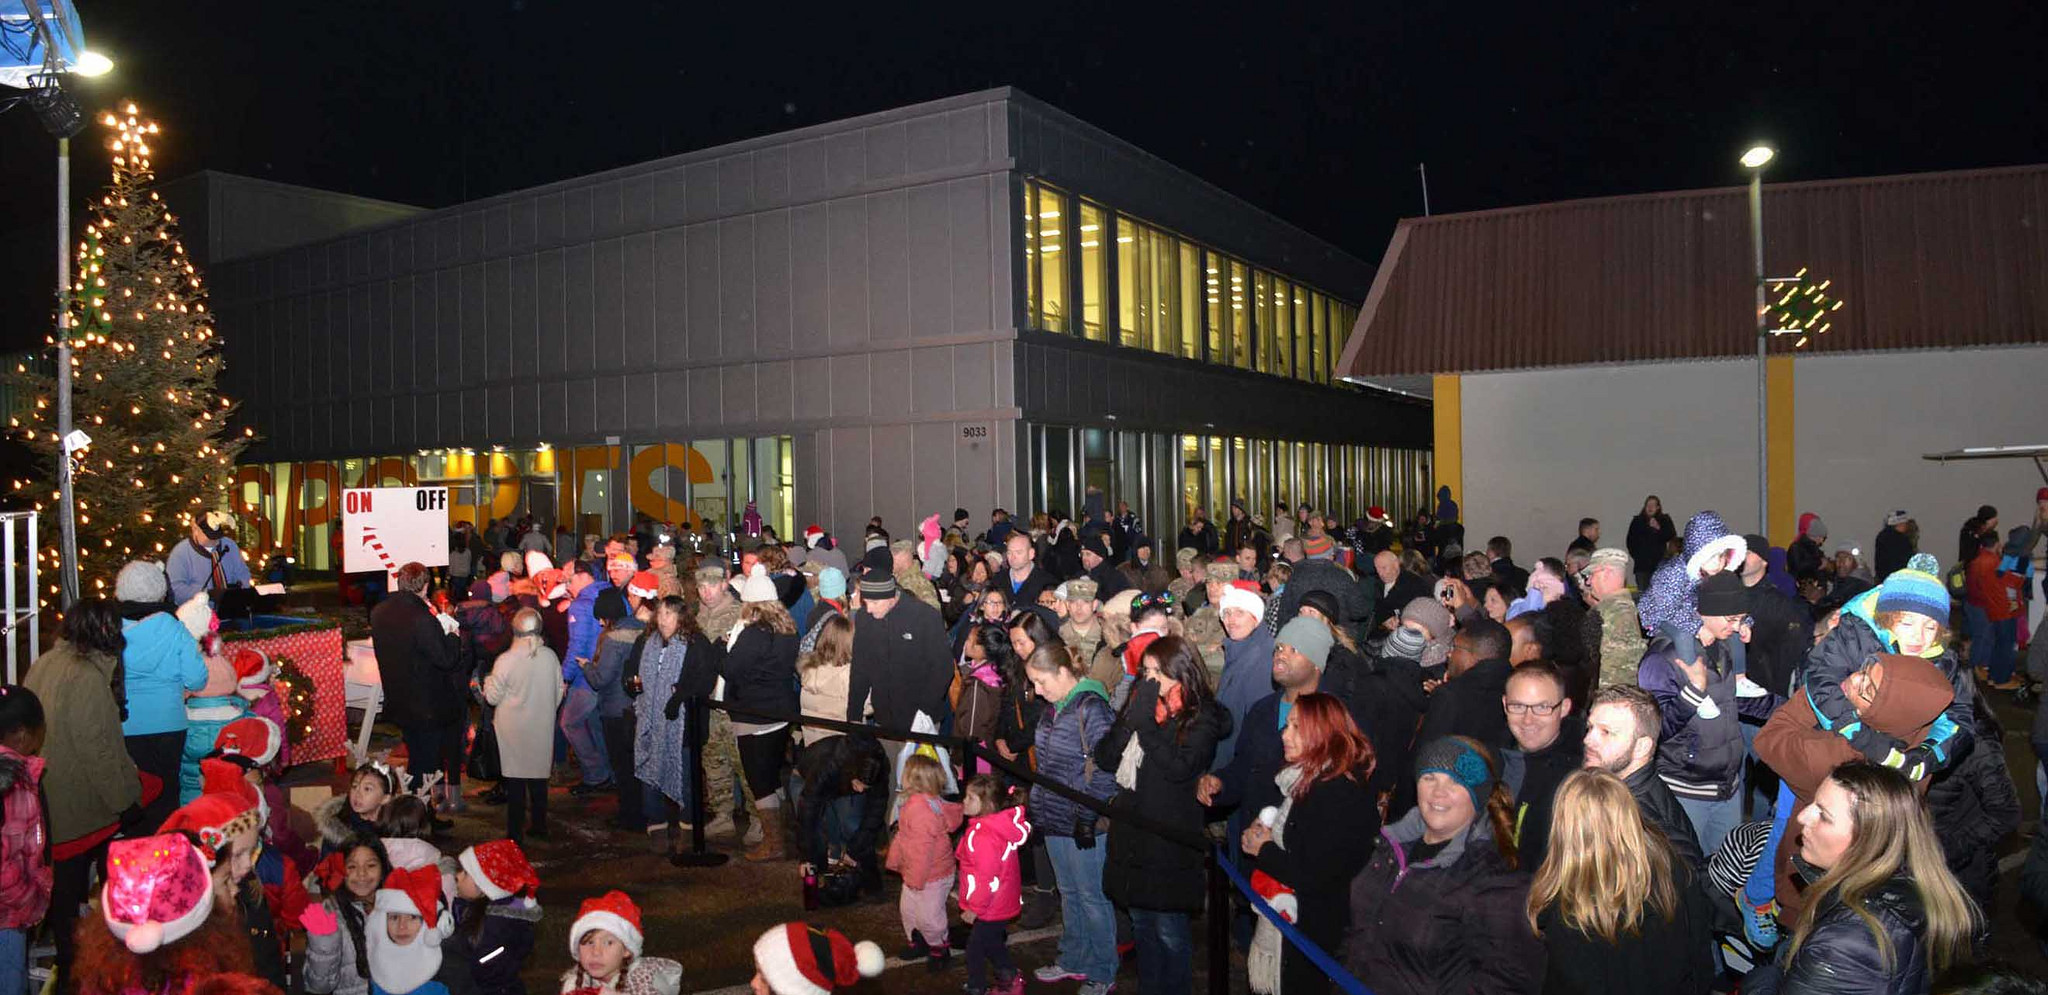 USAG Ansbach begins holiday season with Tree Lighting